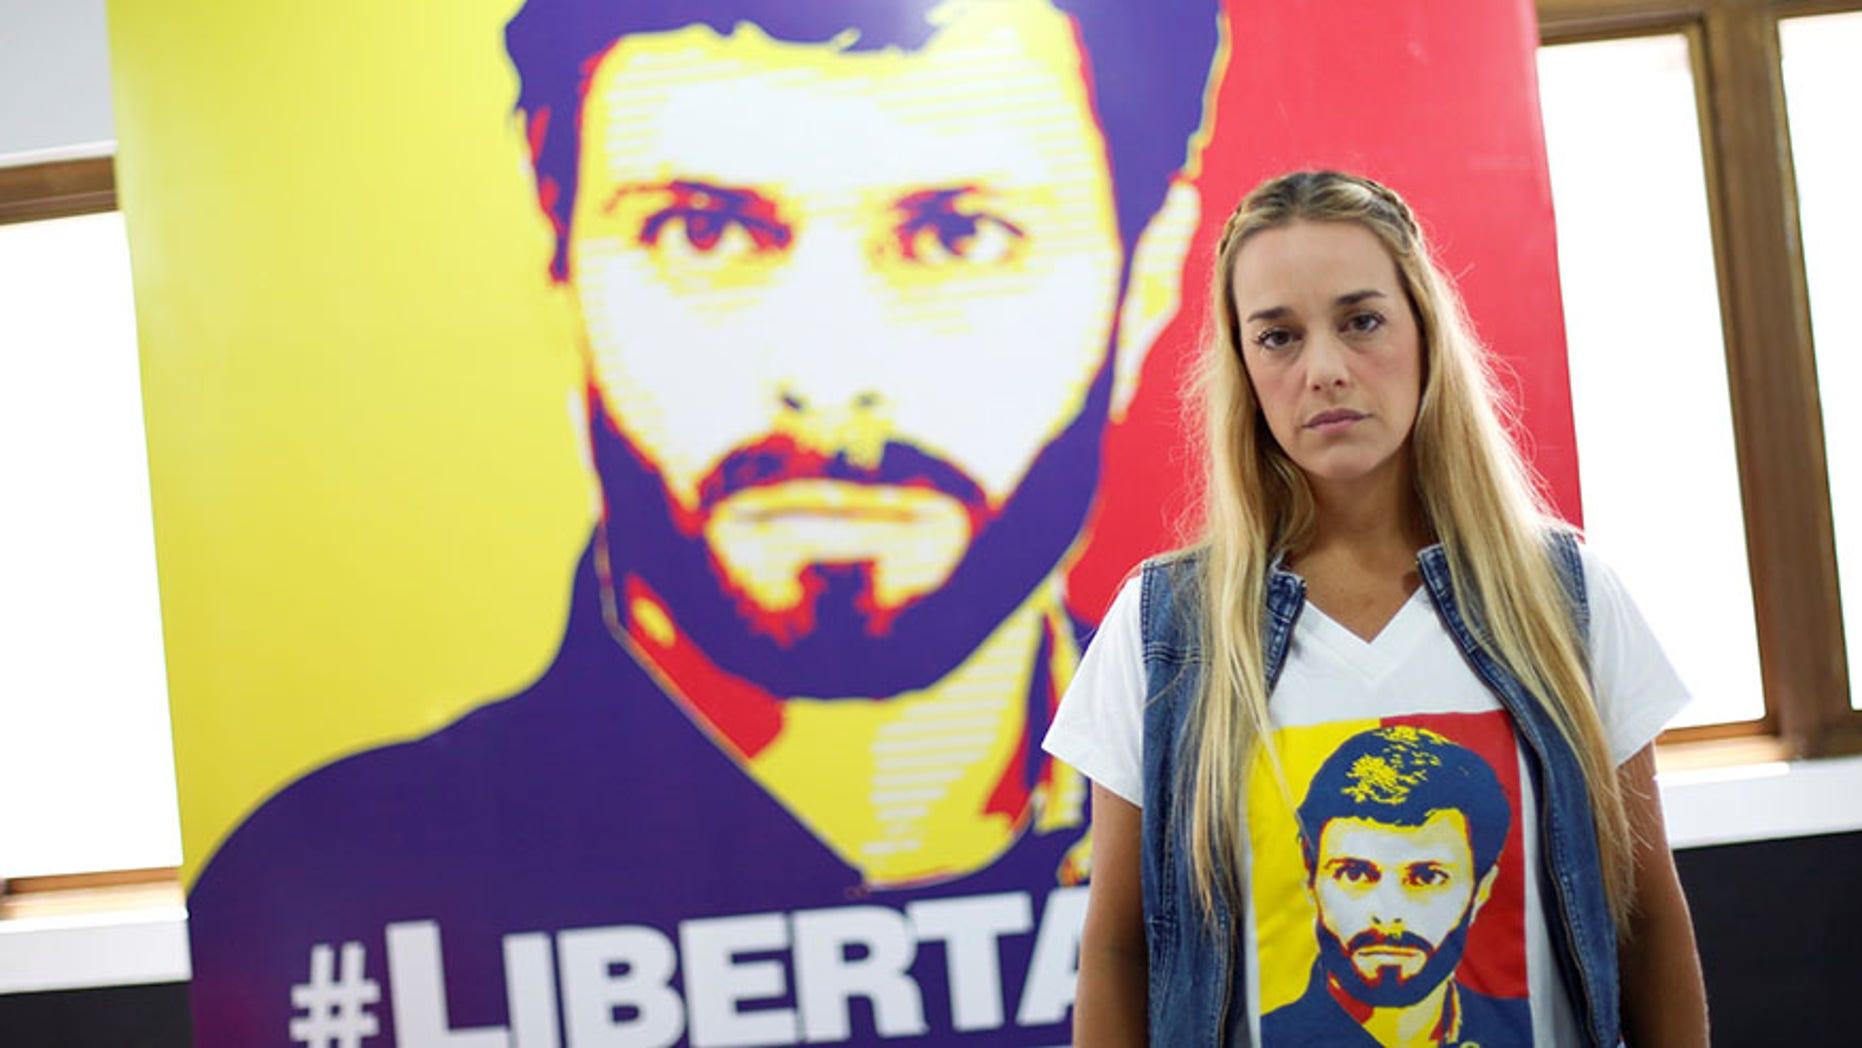 Lilian Tintori, wife of jailed Venezuelan opposition leader Leopoldo Lopez, on Jan. 18, 2017.